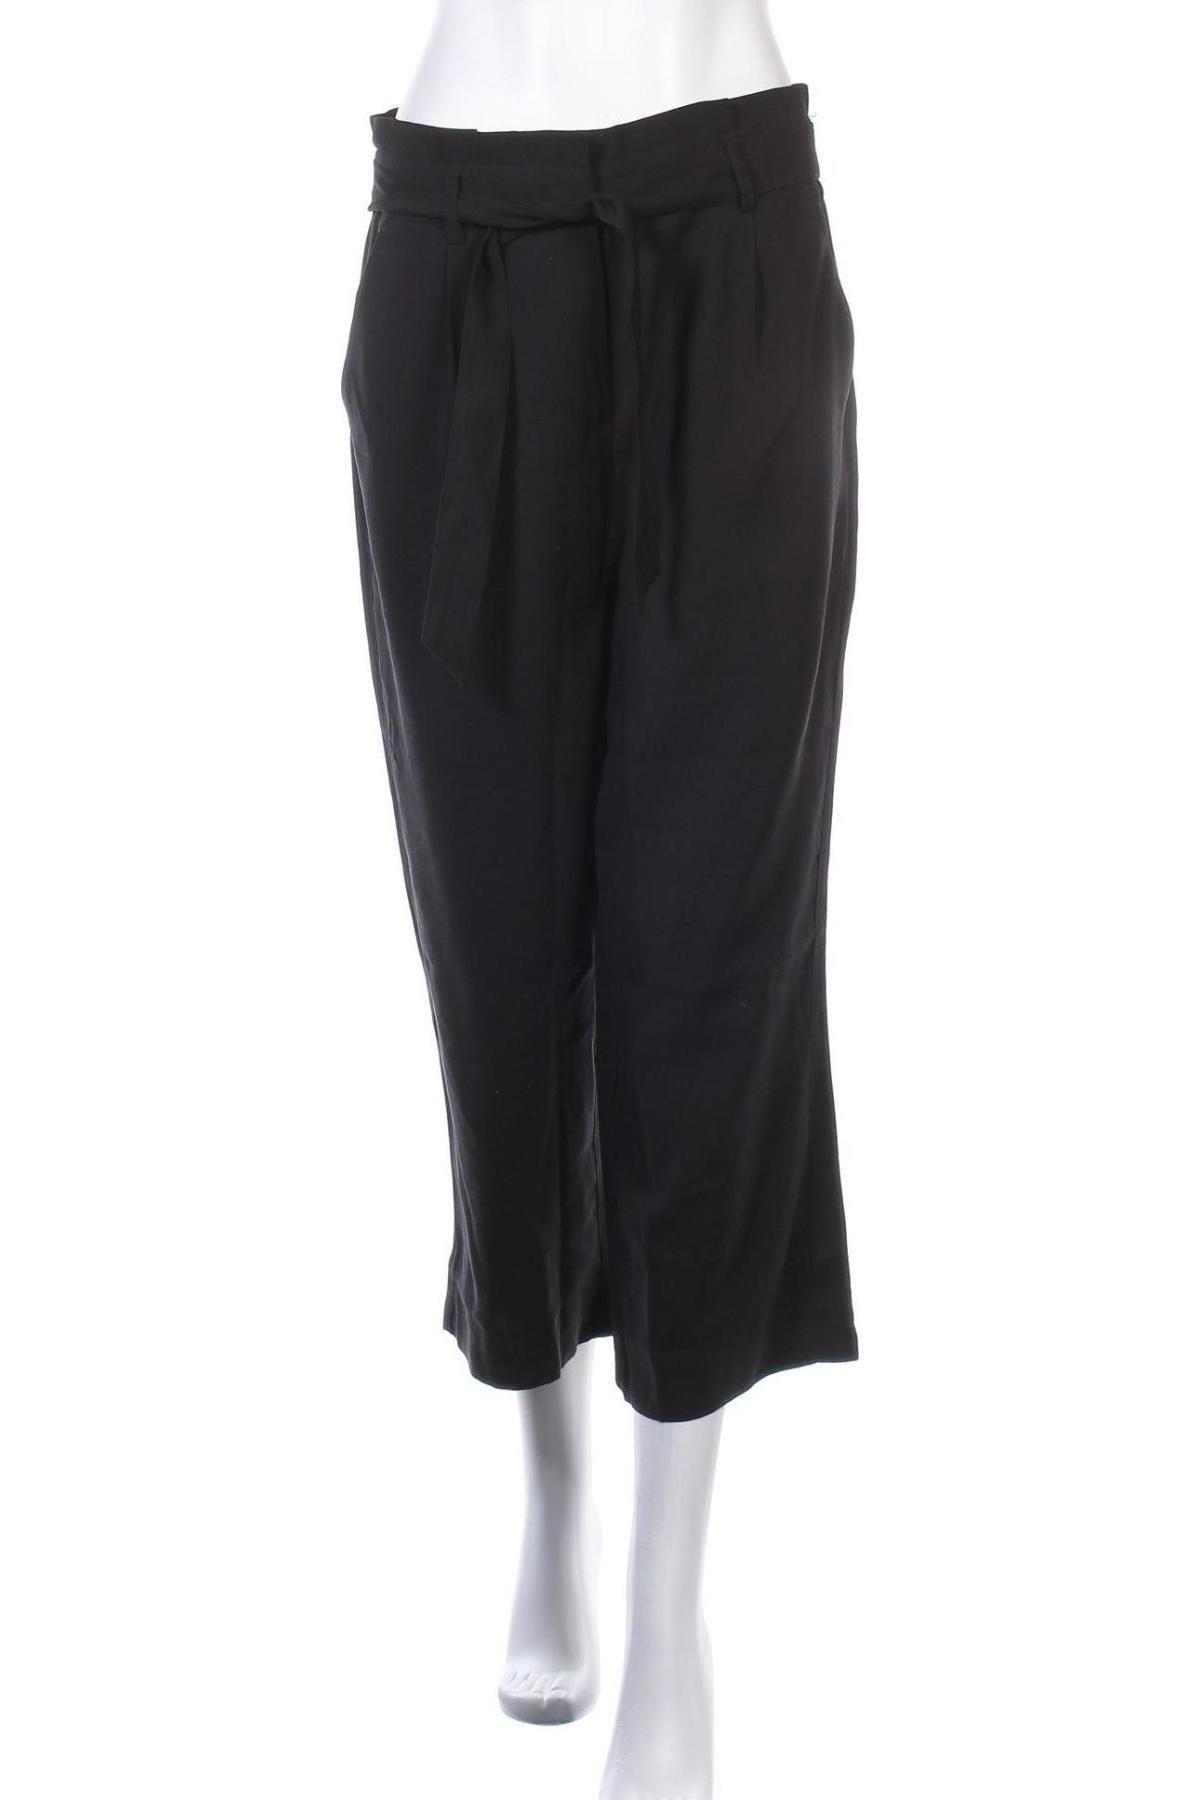 Дамски панталон Vero Moda, Размер M, Цвят Черен, 93% вискоза, 7% полиестер, Цена 31,05лв.